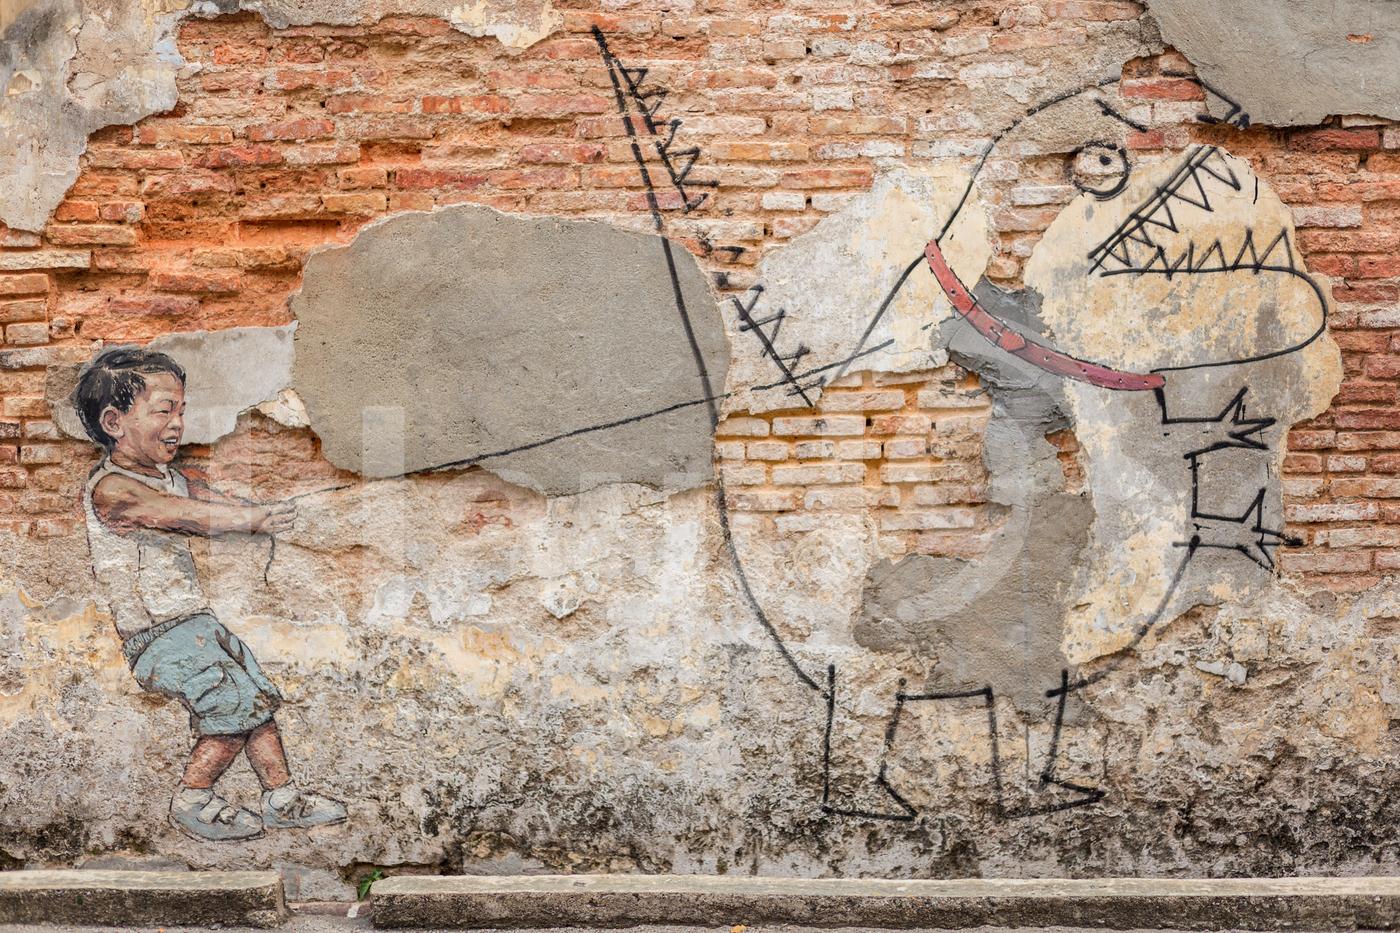 Boy pulling his pet dinosaur street art